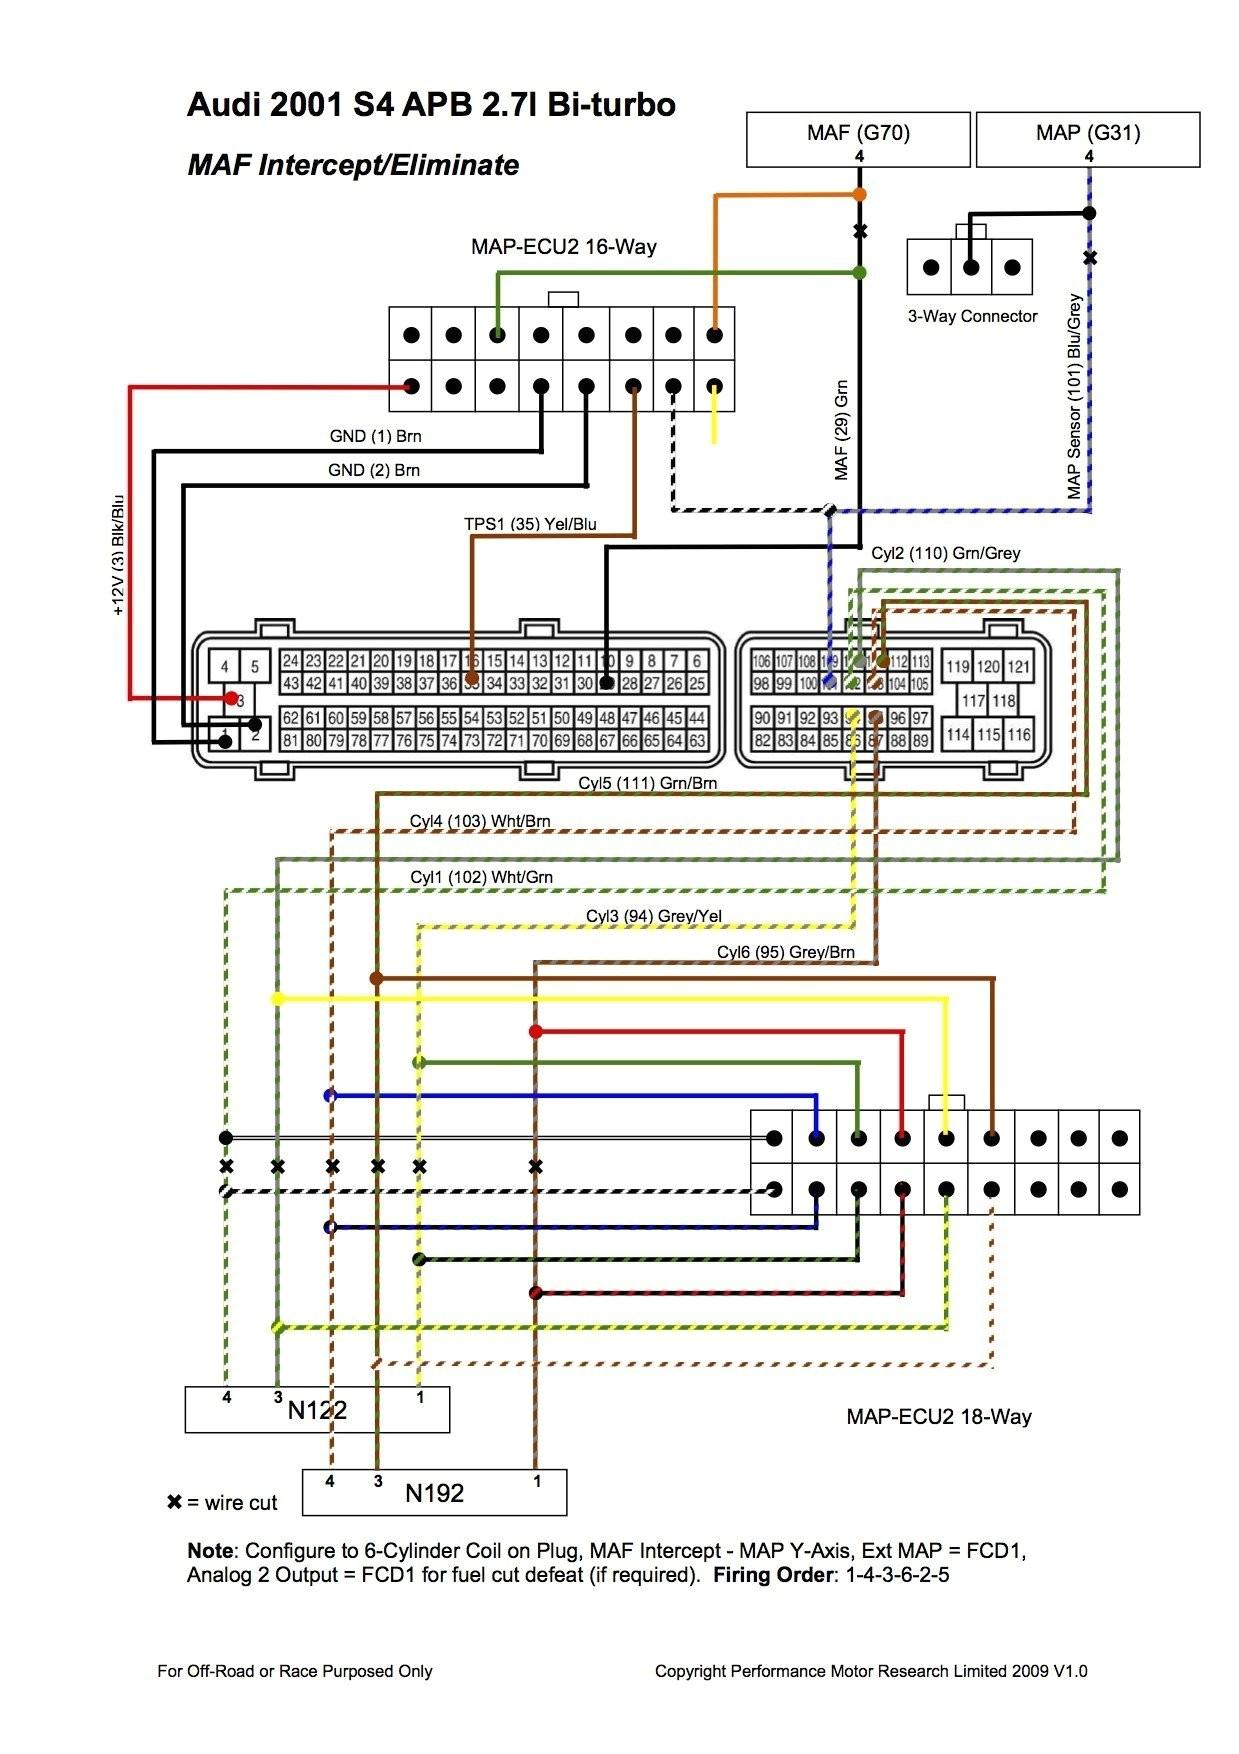 wiring diagram 2000 audi s4 wiring diagrams favorites 1994 audi s4 wiring diagram